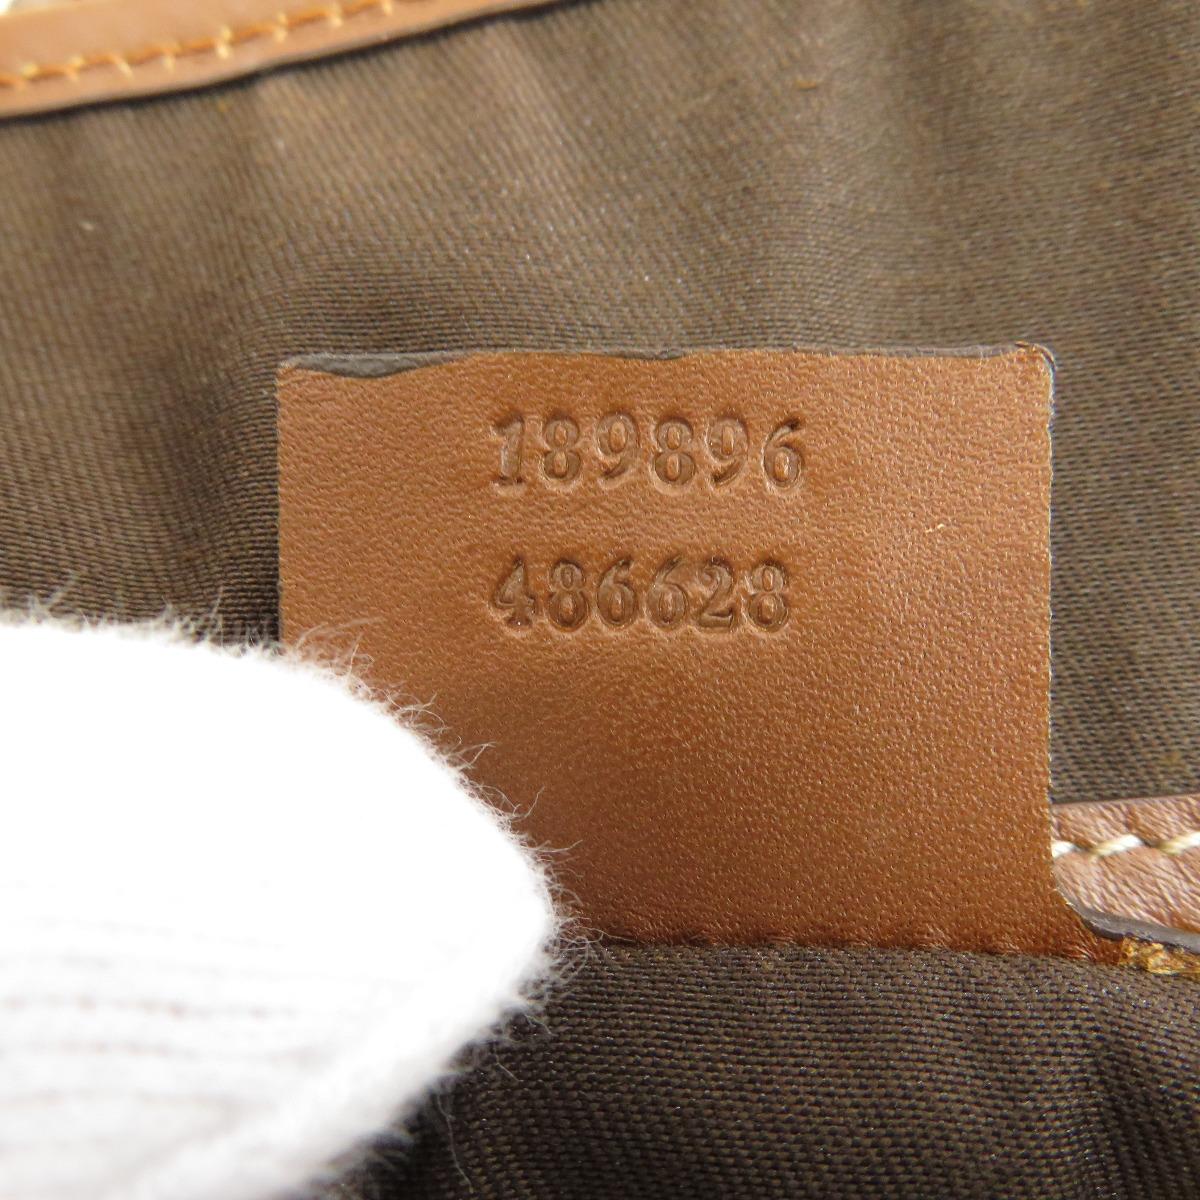 Gucci 189896 Gg Pvc Longchamp Le Pliage Neo Small Handbag 1512578545 Red